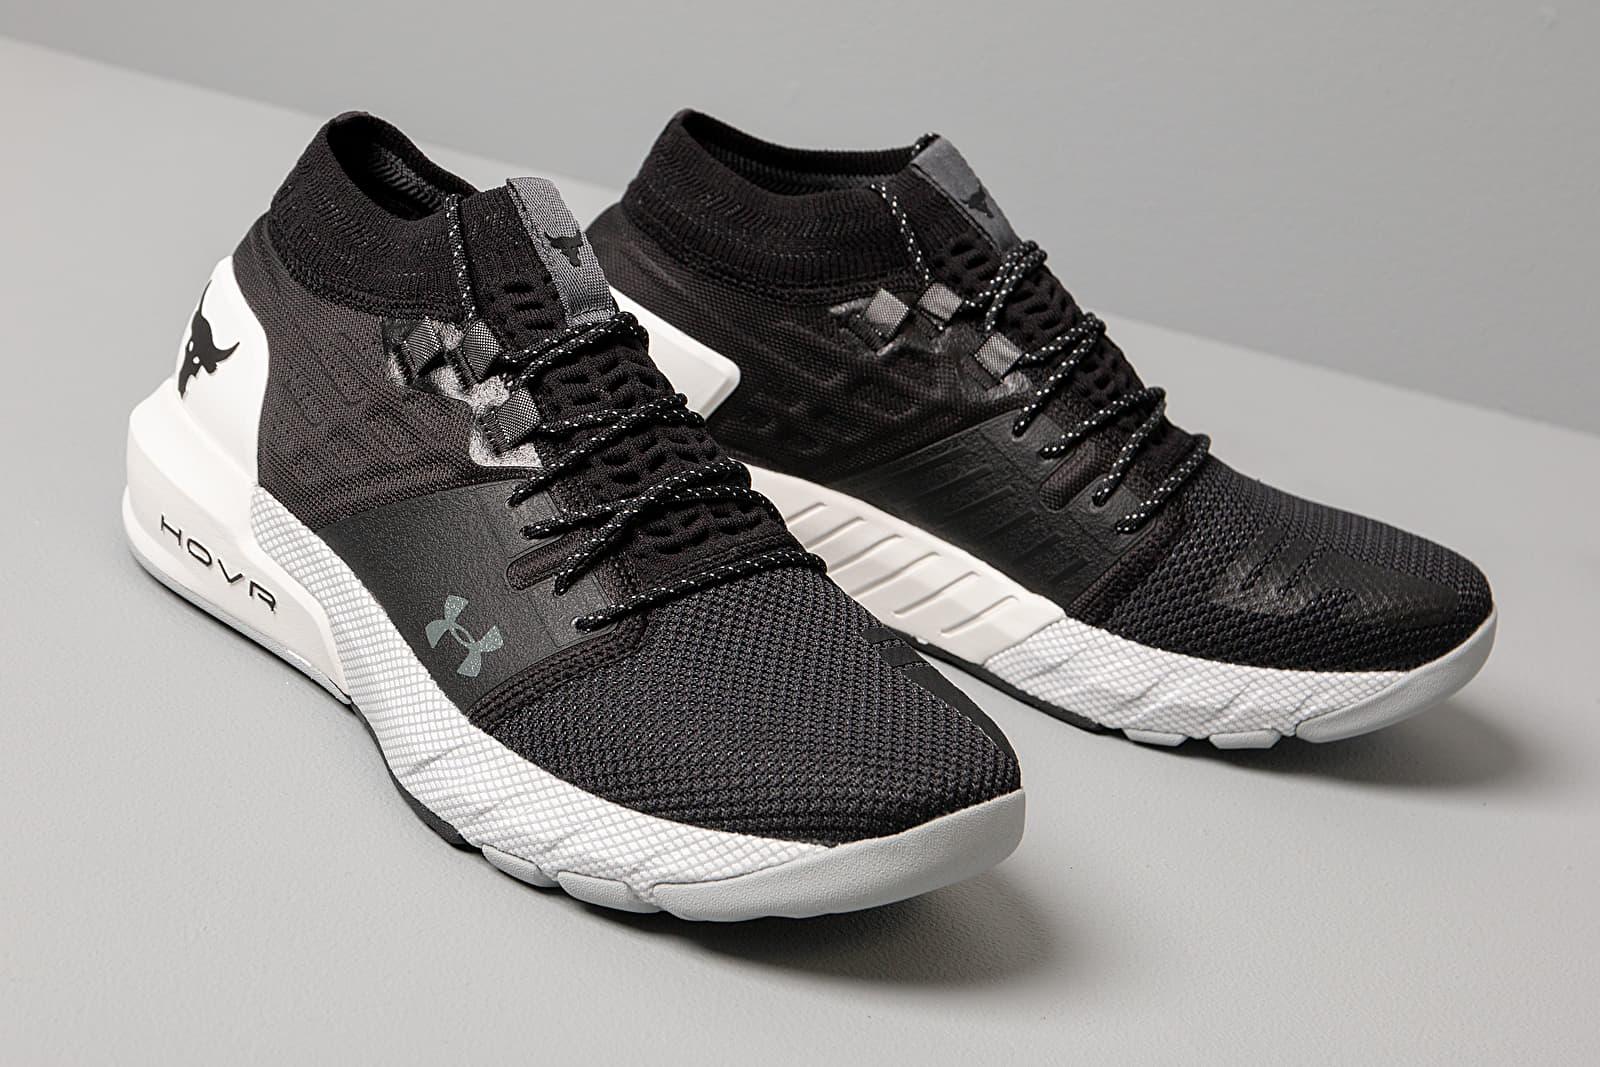 shoes Under Armour Project Rock 2 Black